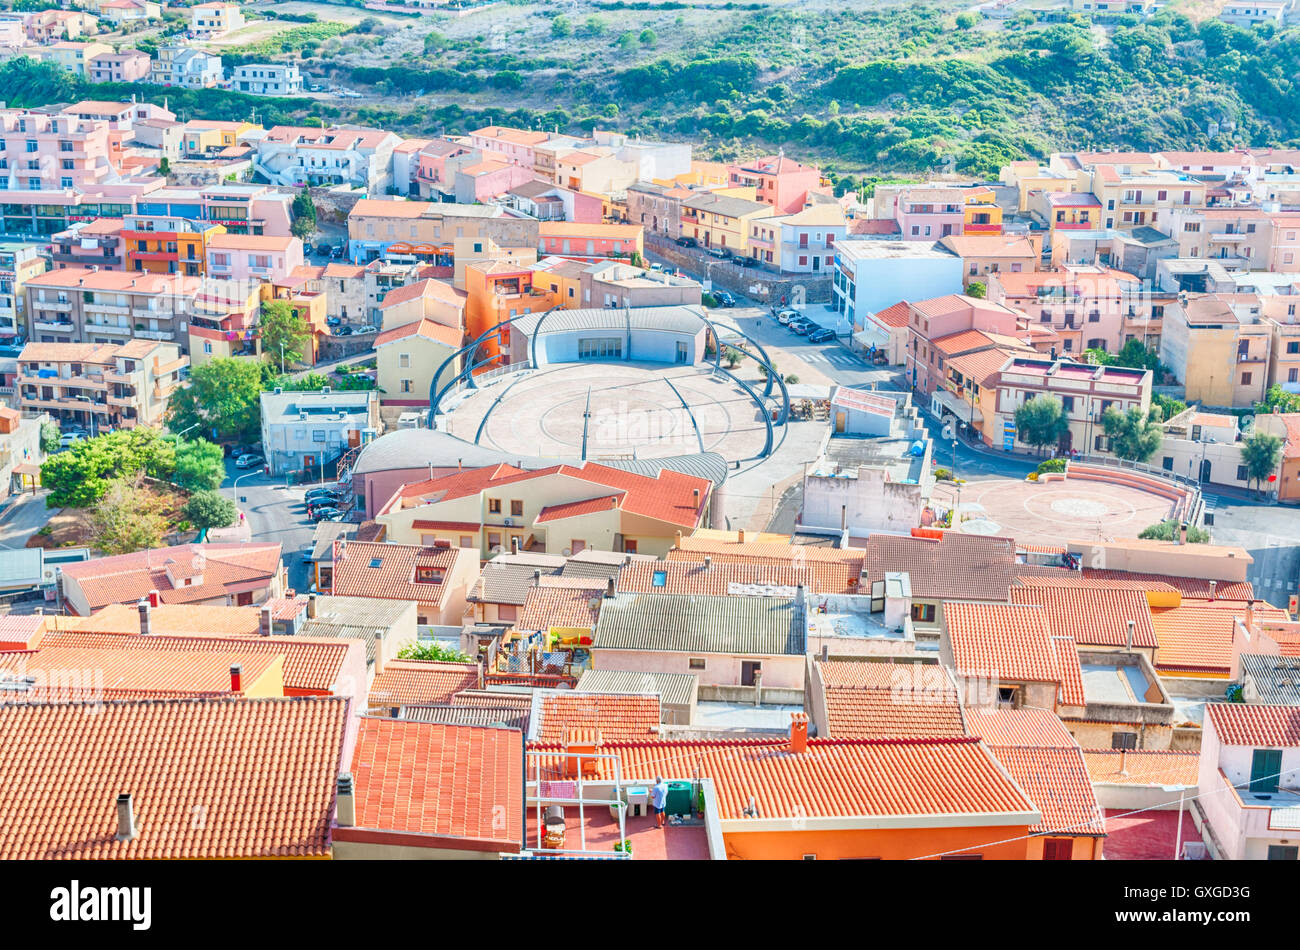 La vieille ville de Castelsardo - Sardaigne - Italie Photo Stock